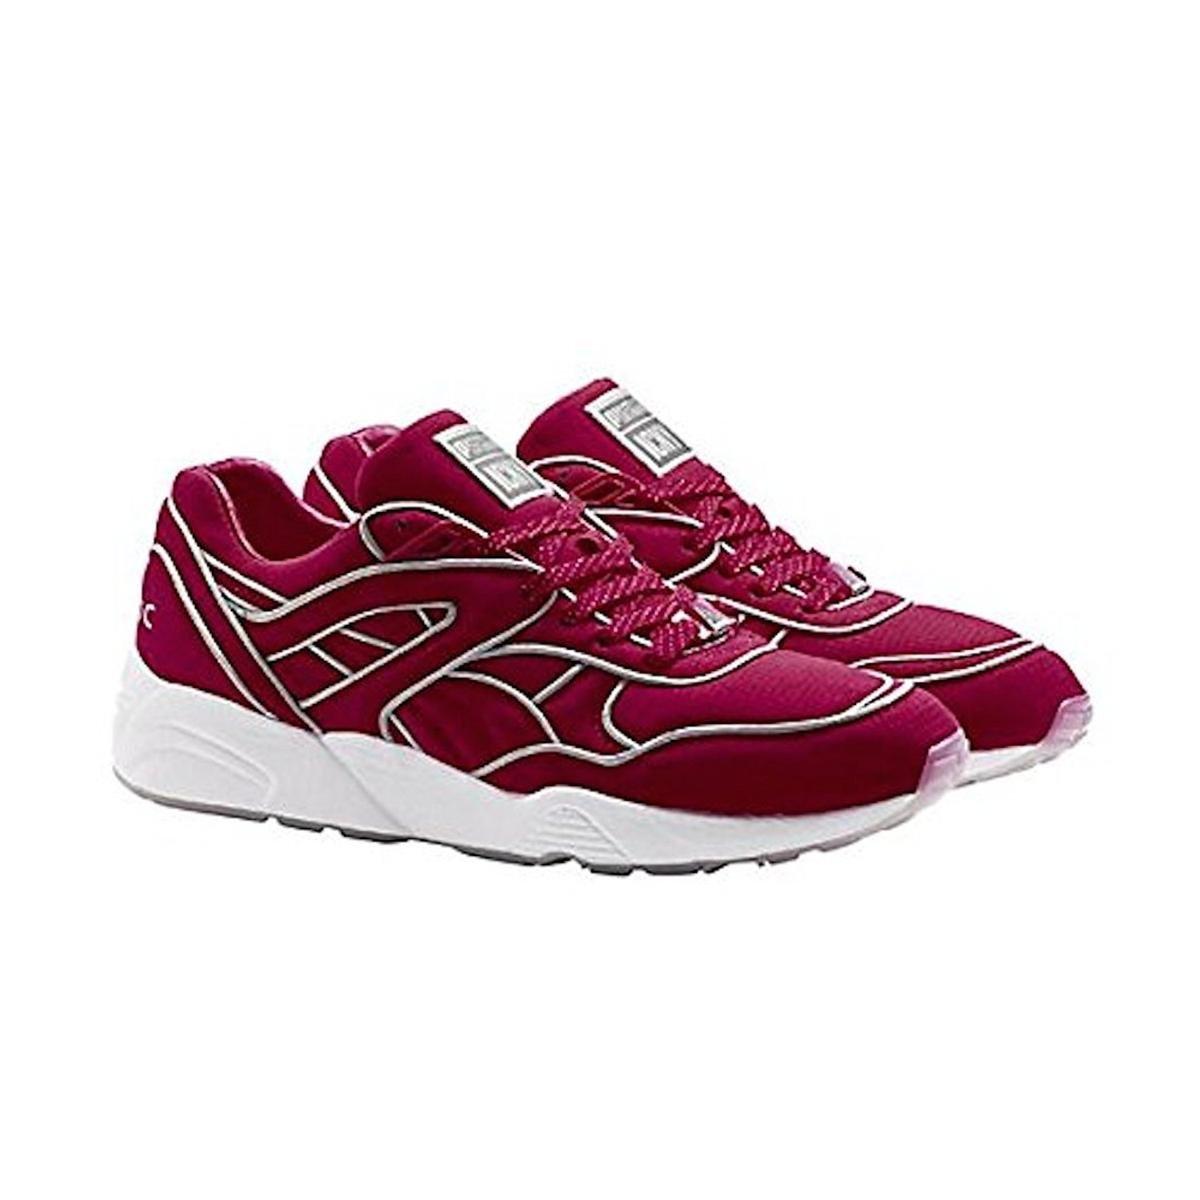 47926d52117 Amazon.com  Puma Men s Trinomic R698 x ICNY Fiery Red Running Shoes (9)   Shoes